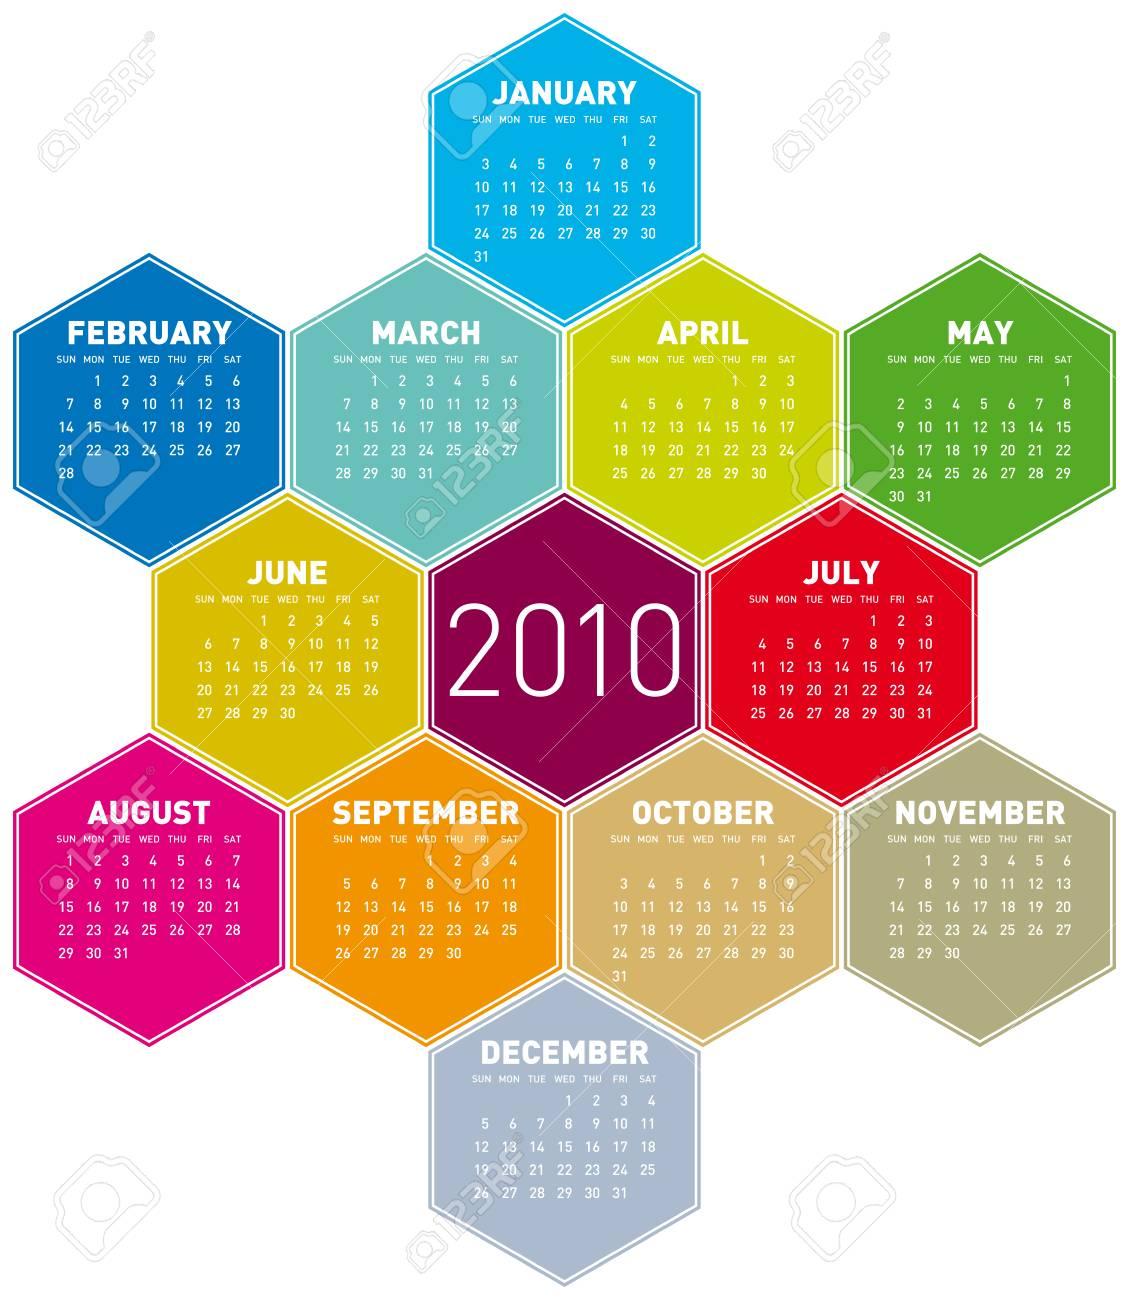 Calendar for year 2010 in an hexagonal pattern (vector format) Stock Vector - 5501583